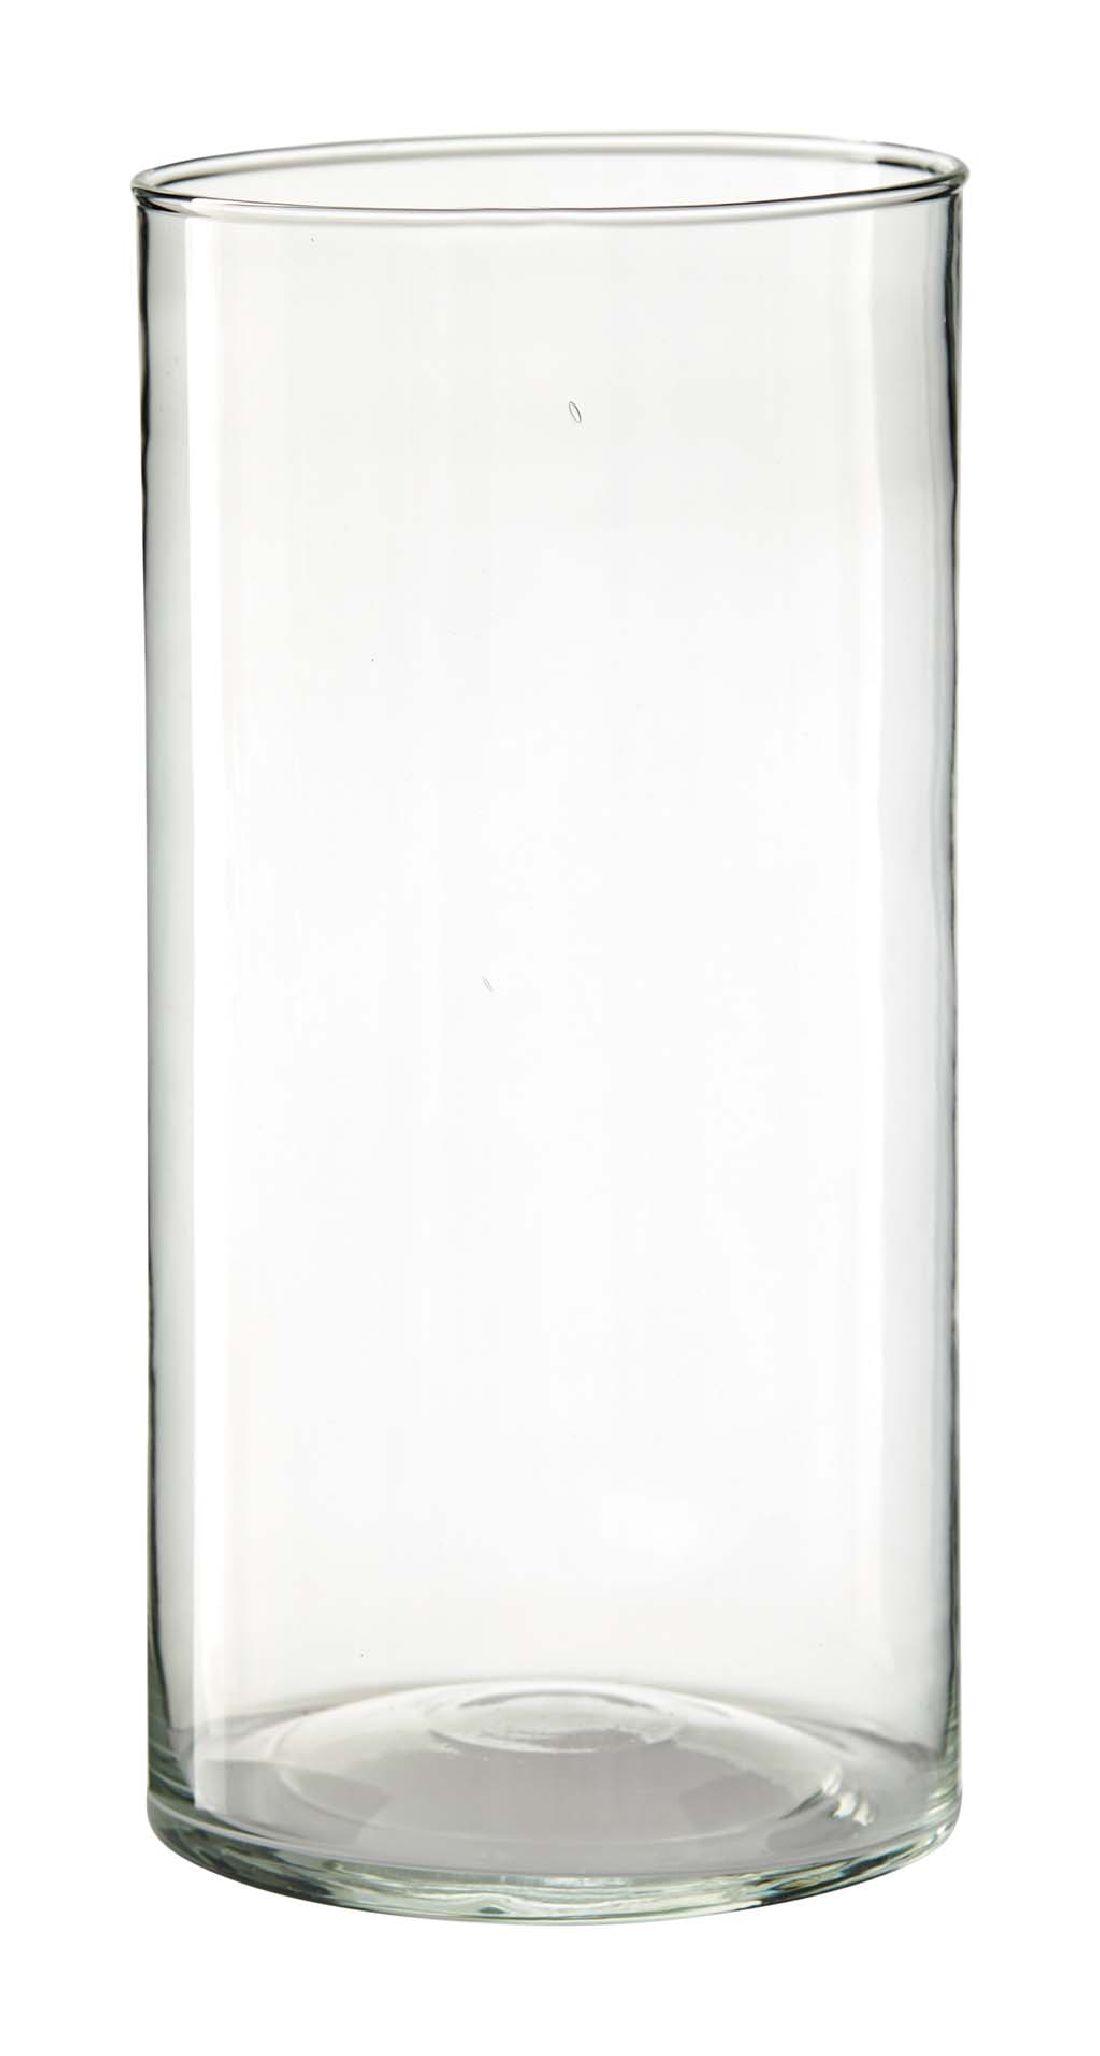 Zylinder Glas KLAR 1851/30 Ø15xh30cm